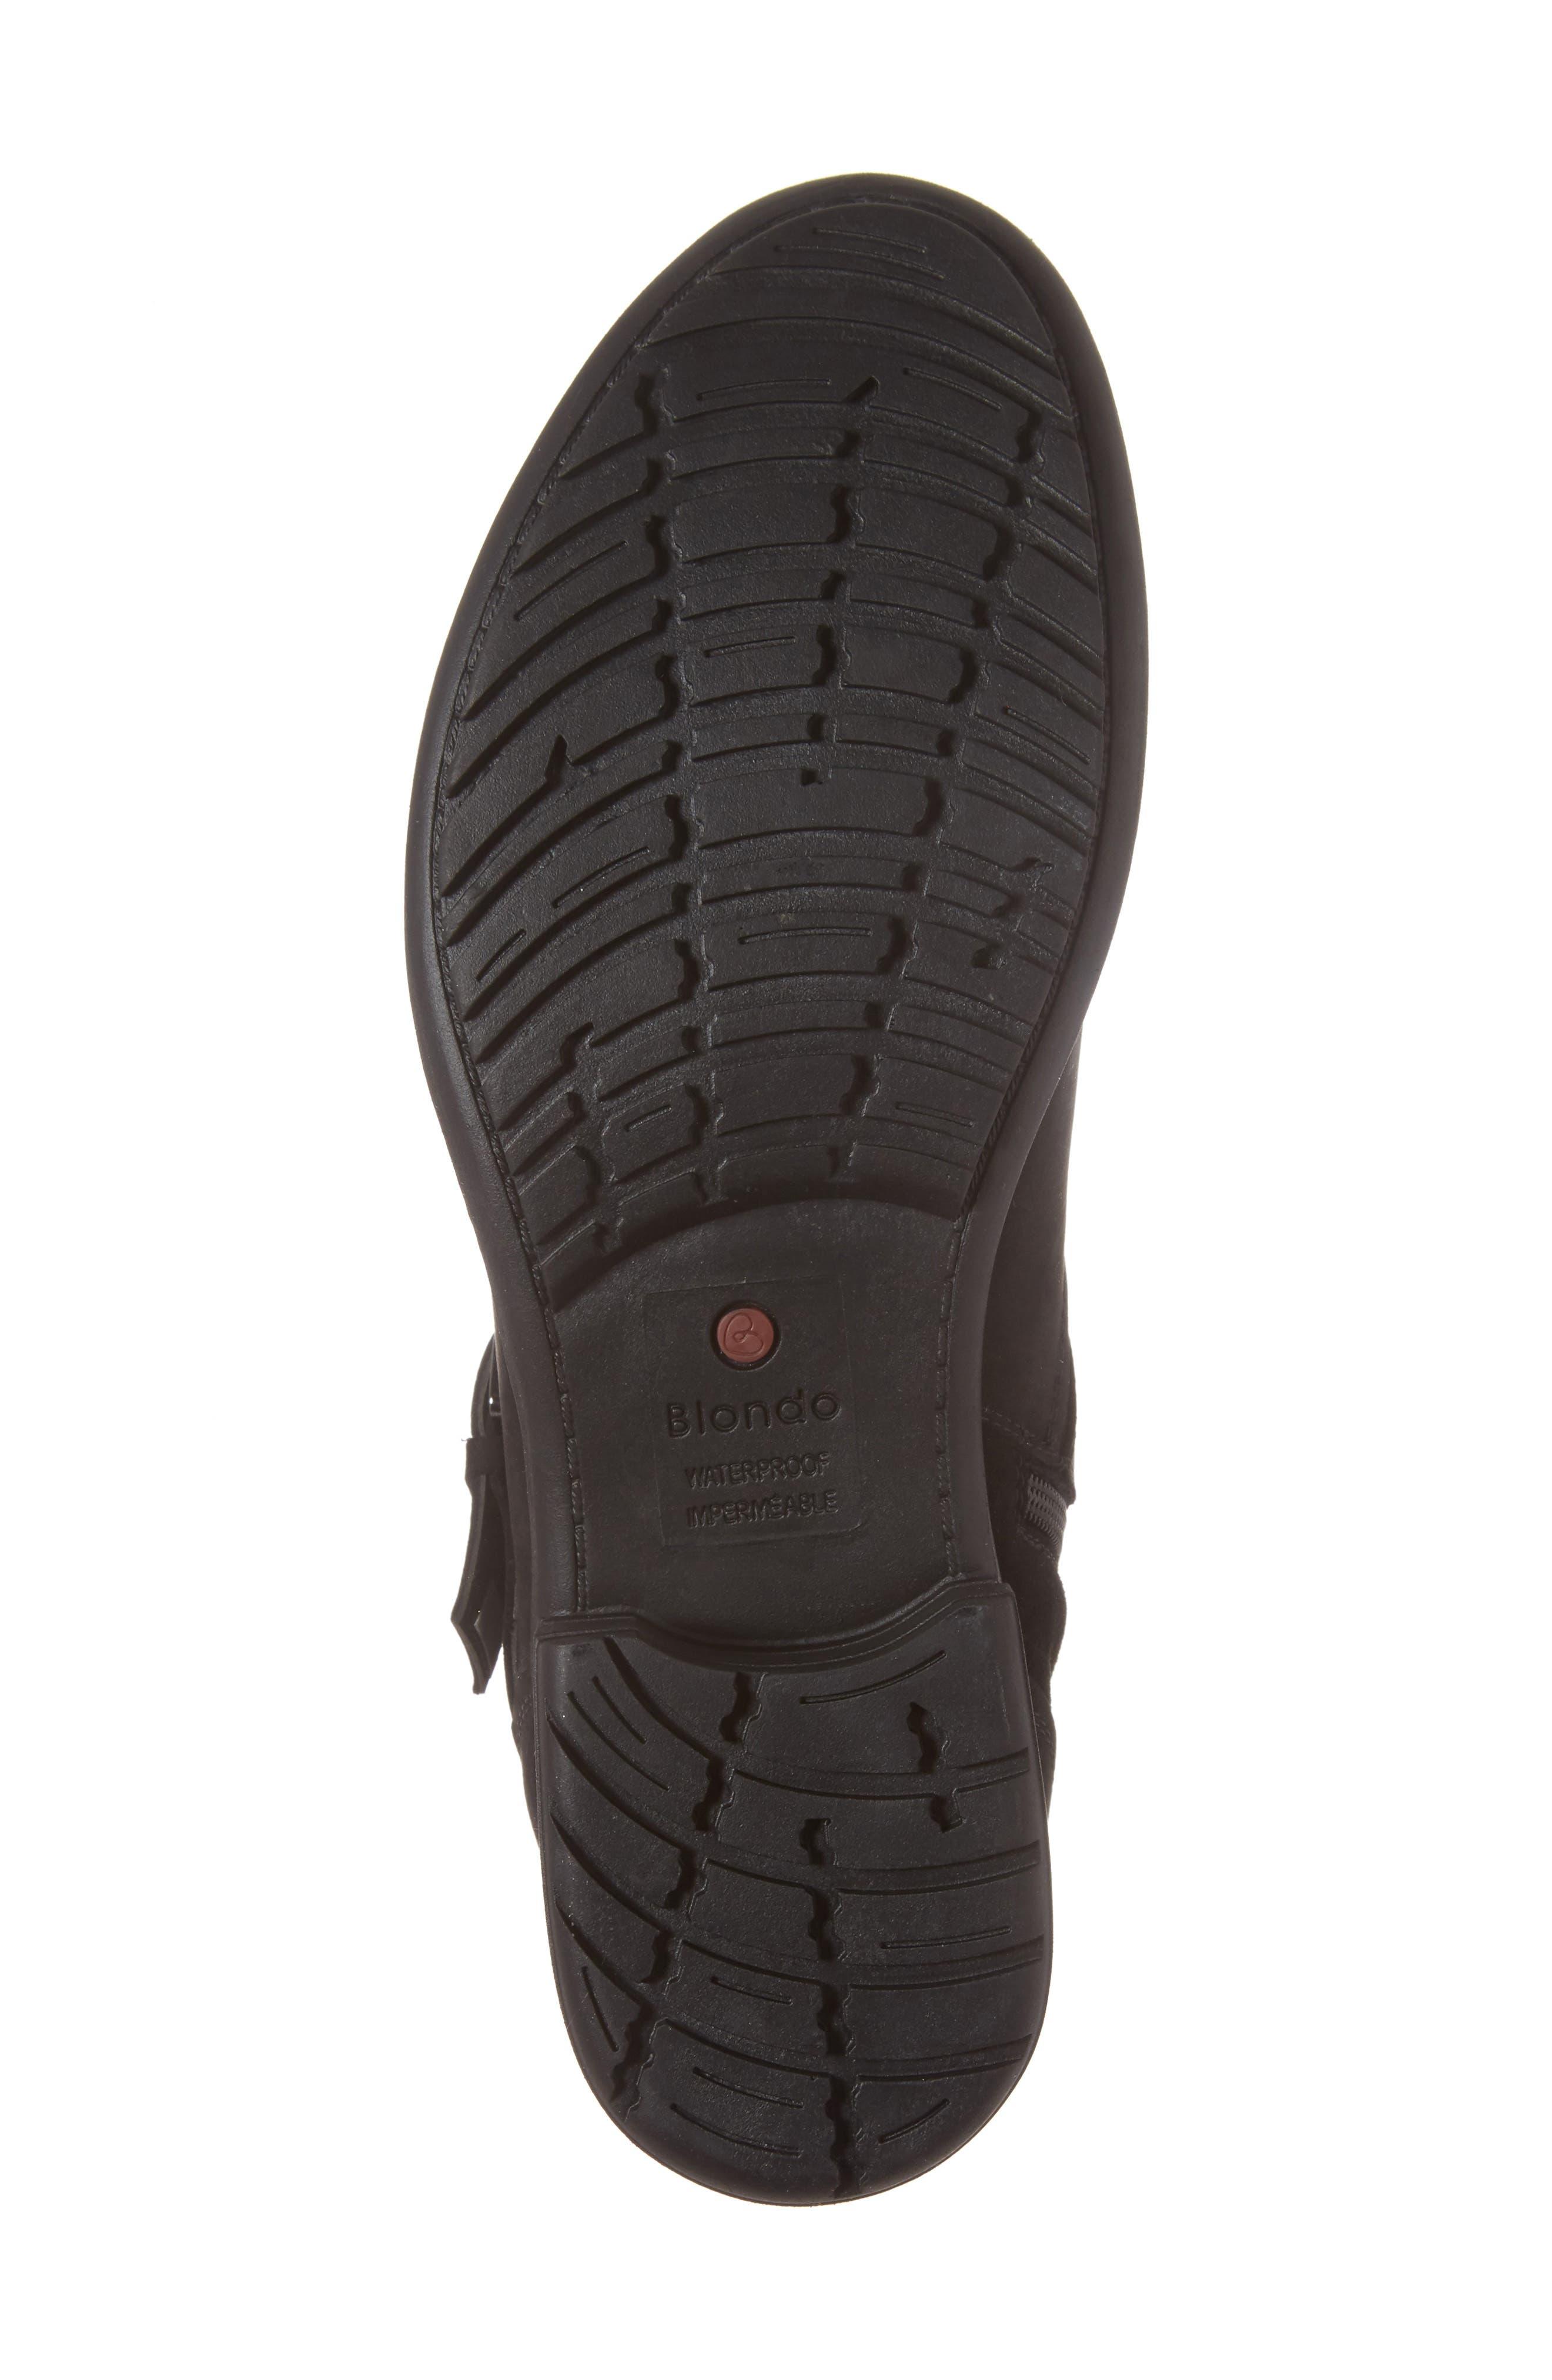 Tula Waterproof Boot,                             Alternate thumbnail 5, color,                             Black Nubuck Leather